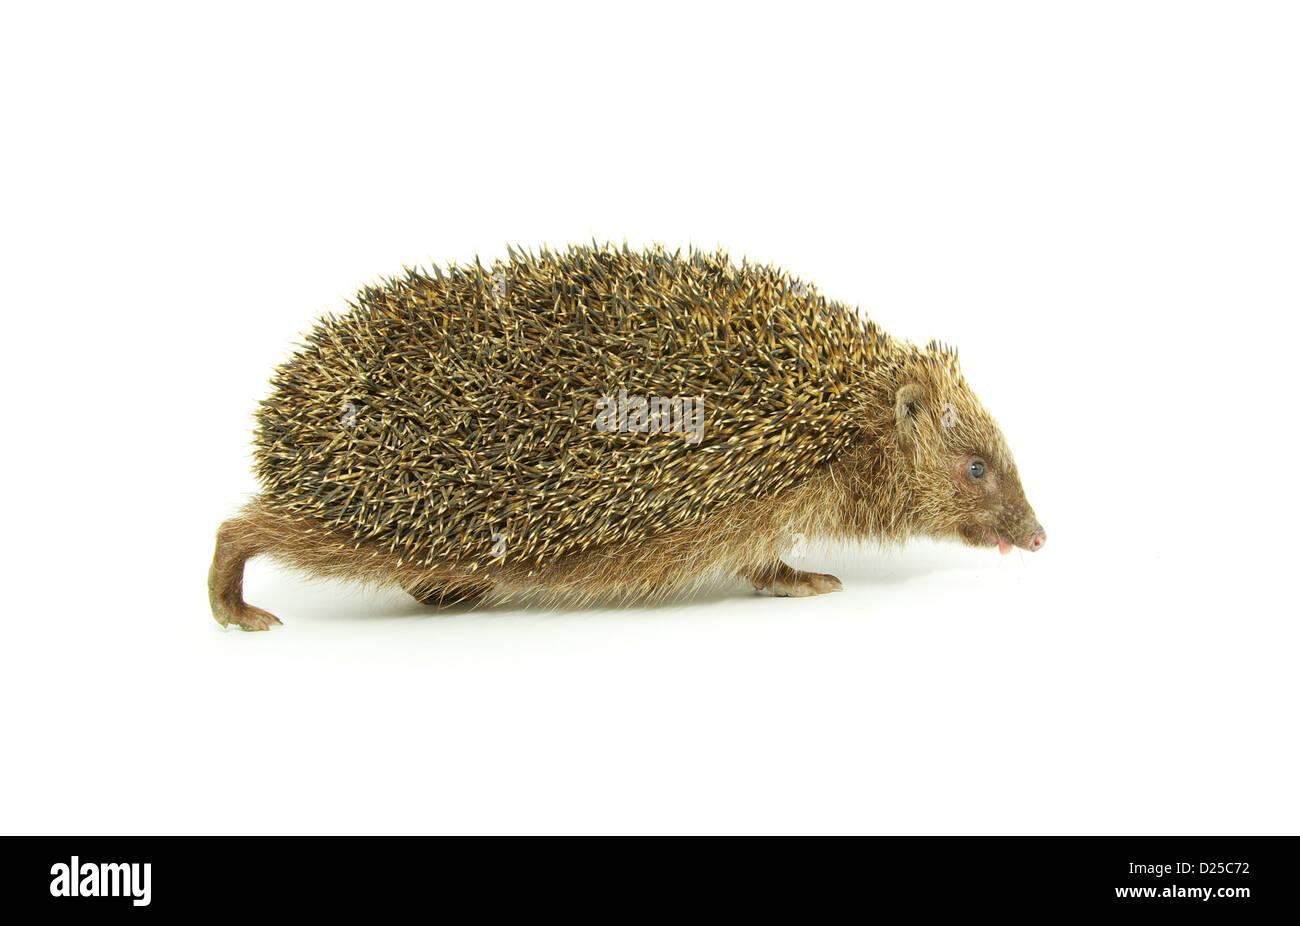 Hedgehog isolated on a white background - Stock Image